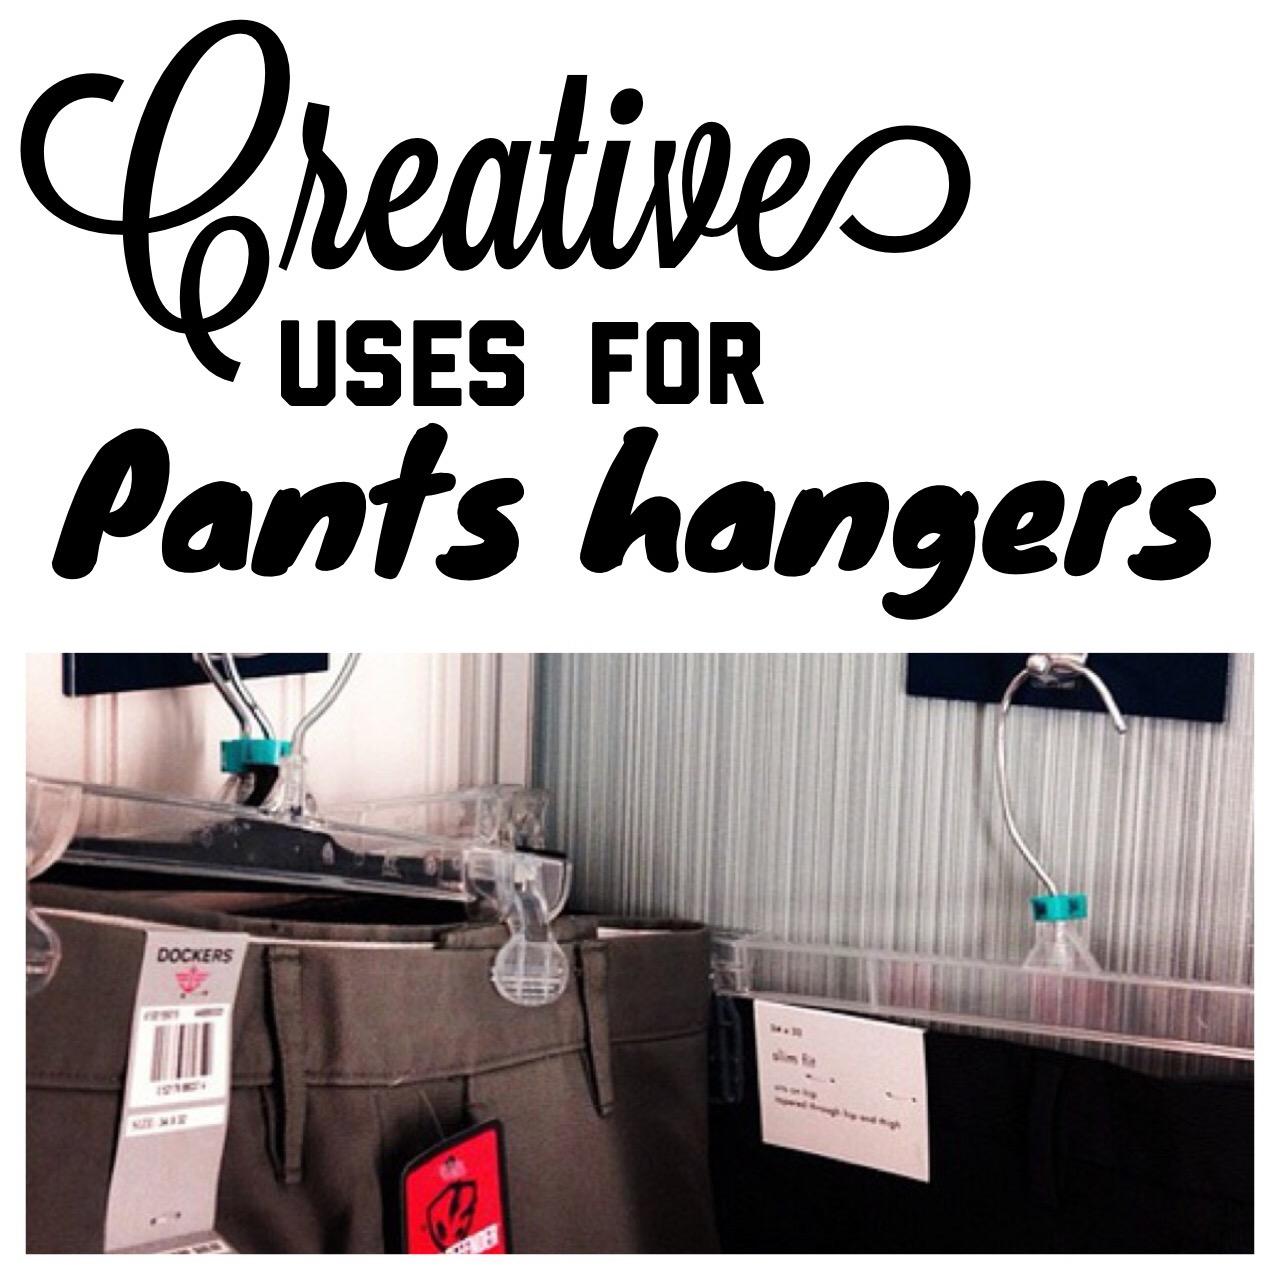 Creative uses for pants hangers